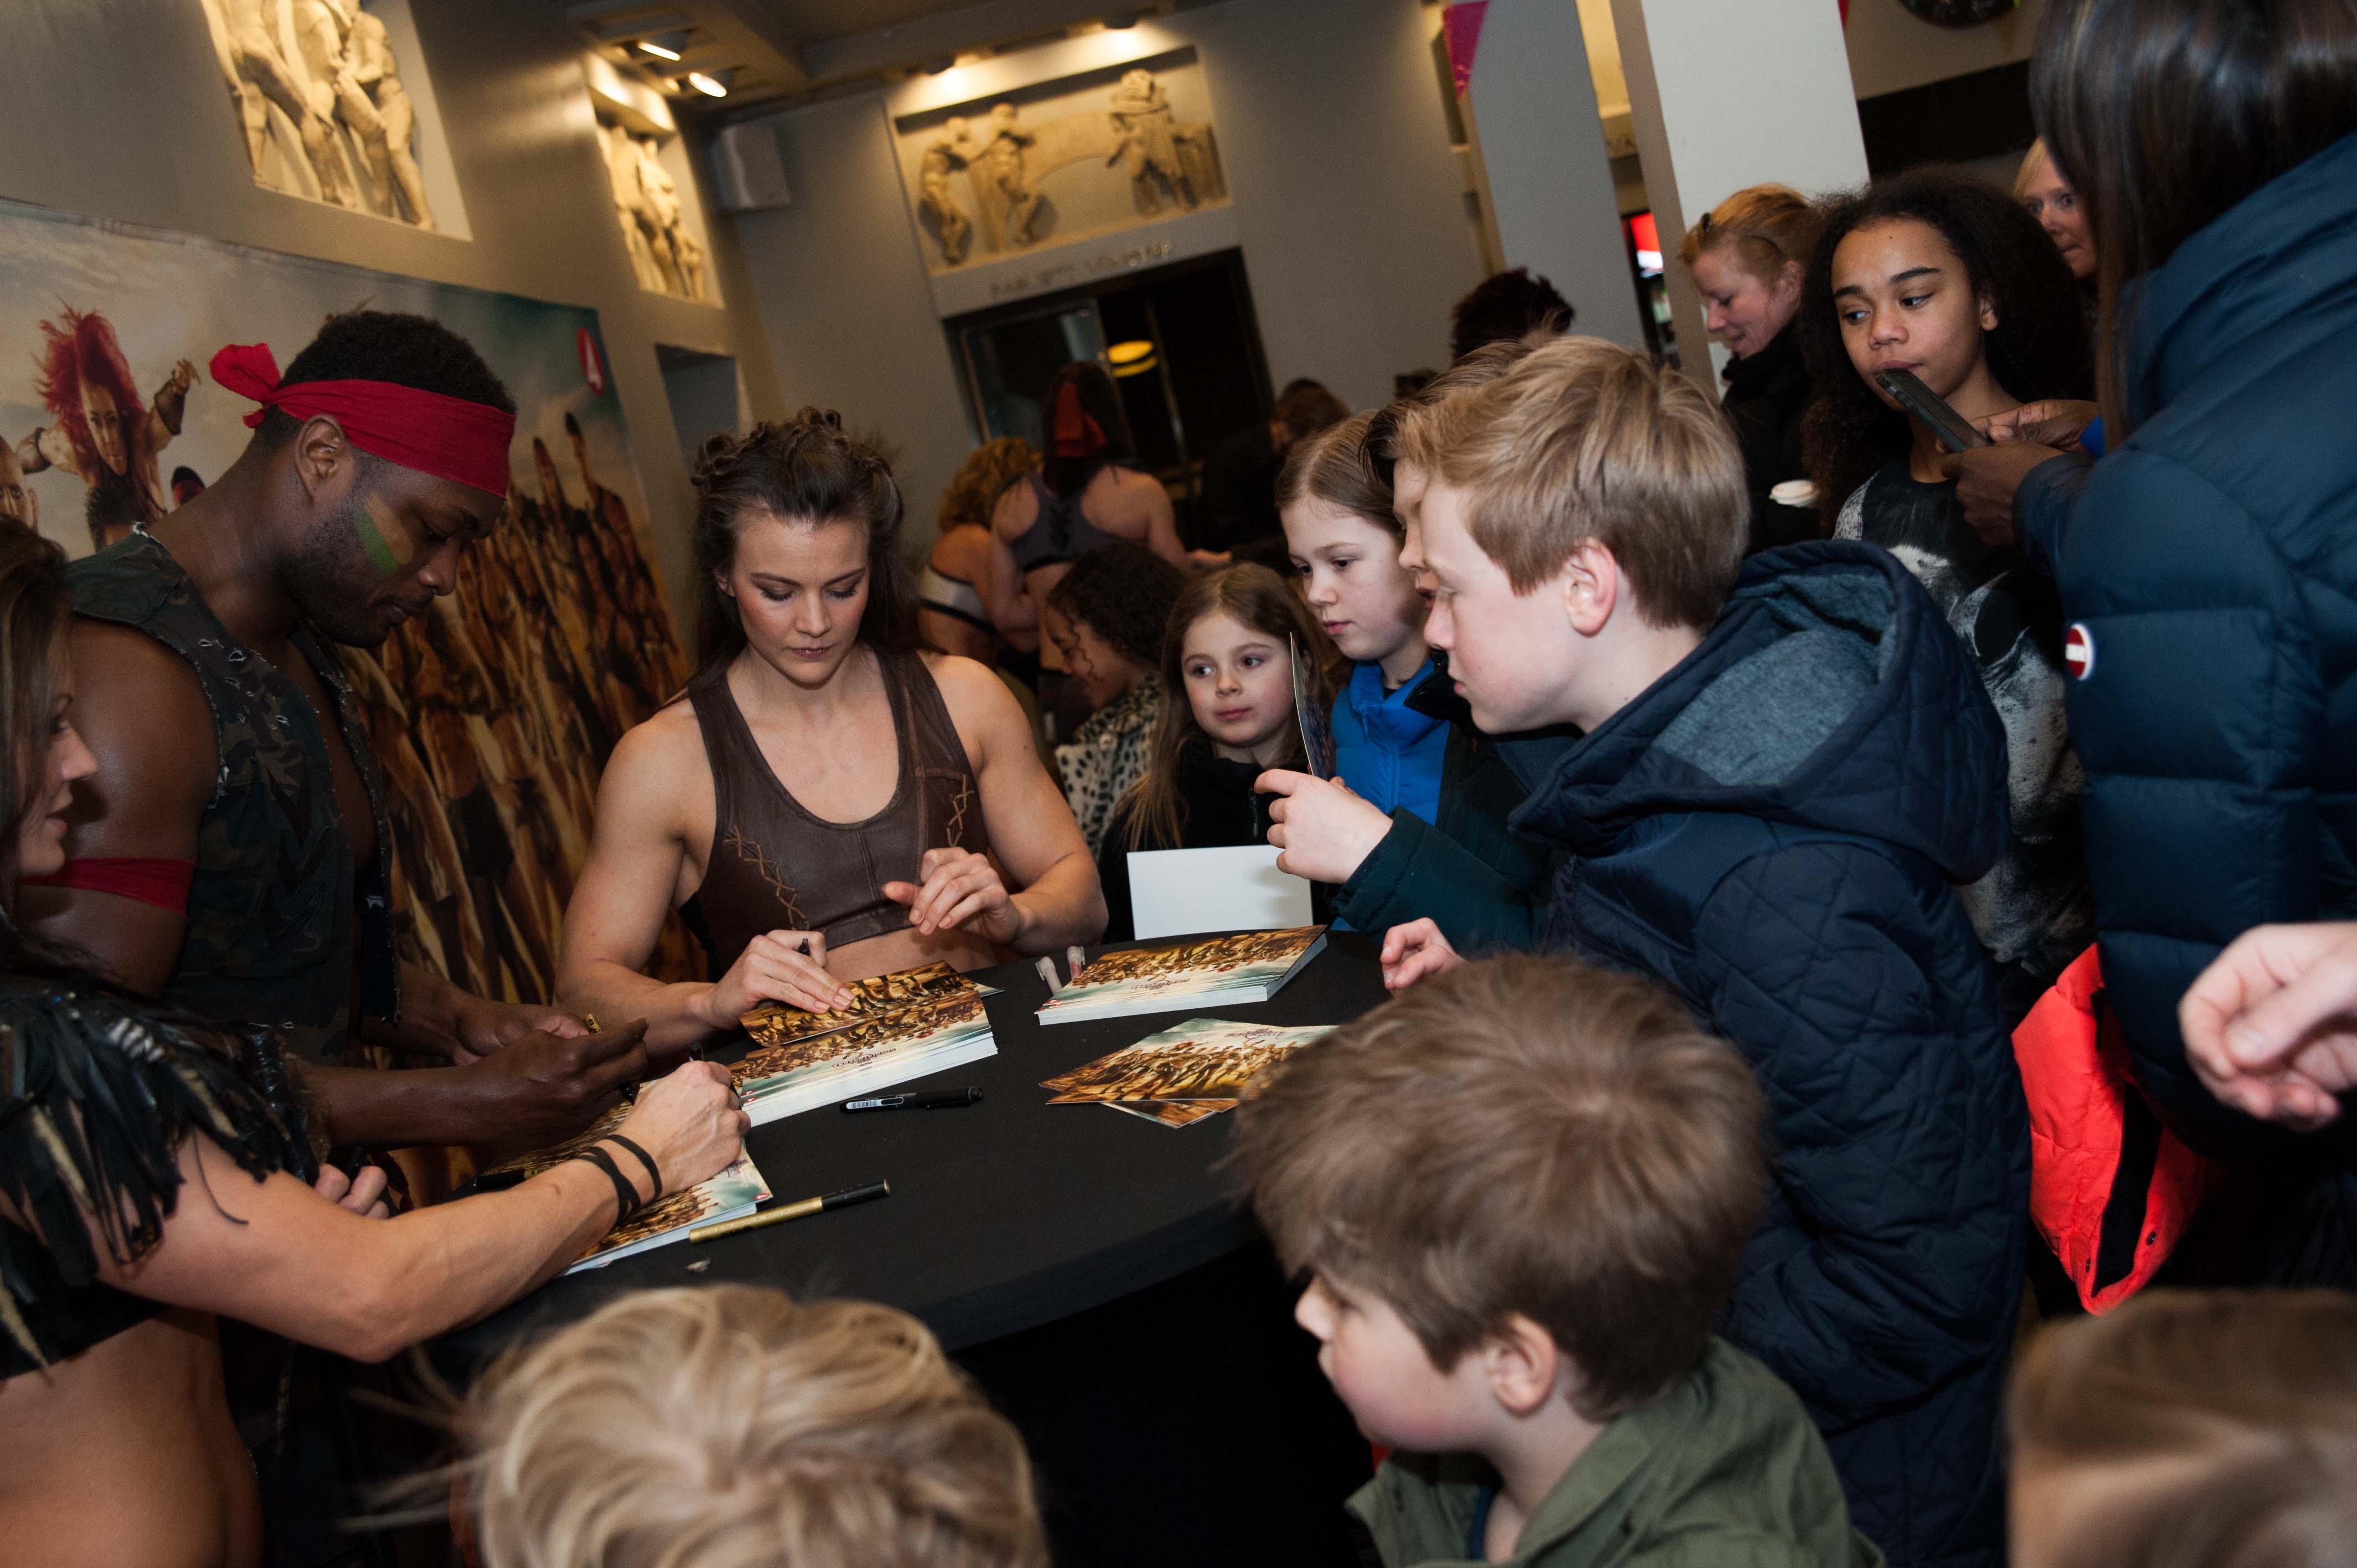 Still of Zimzon Zion signing autographs at Gladiatorerna premiere